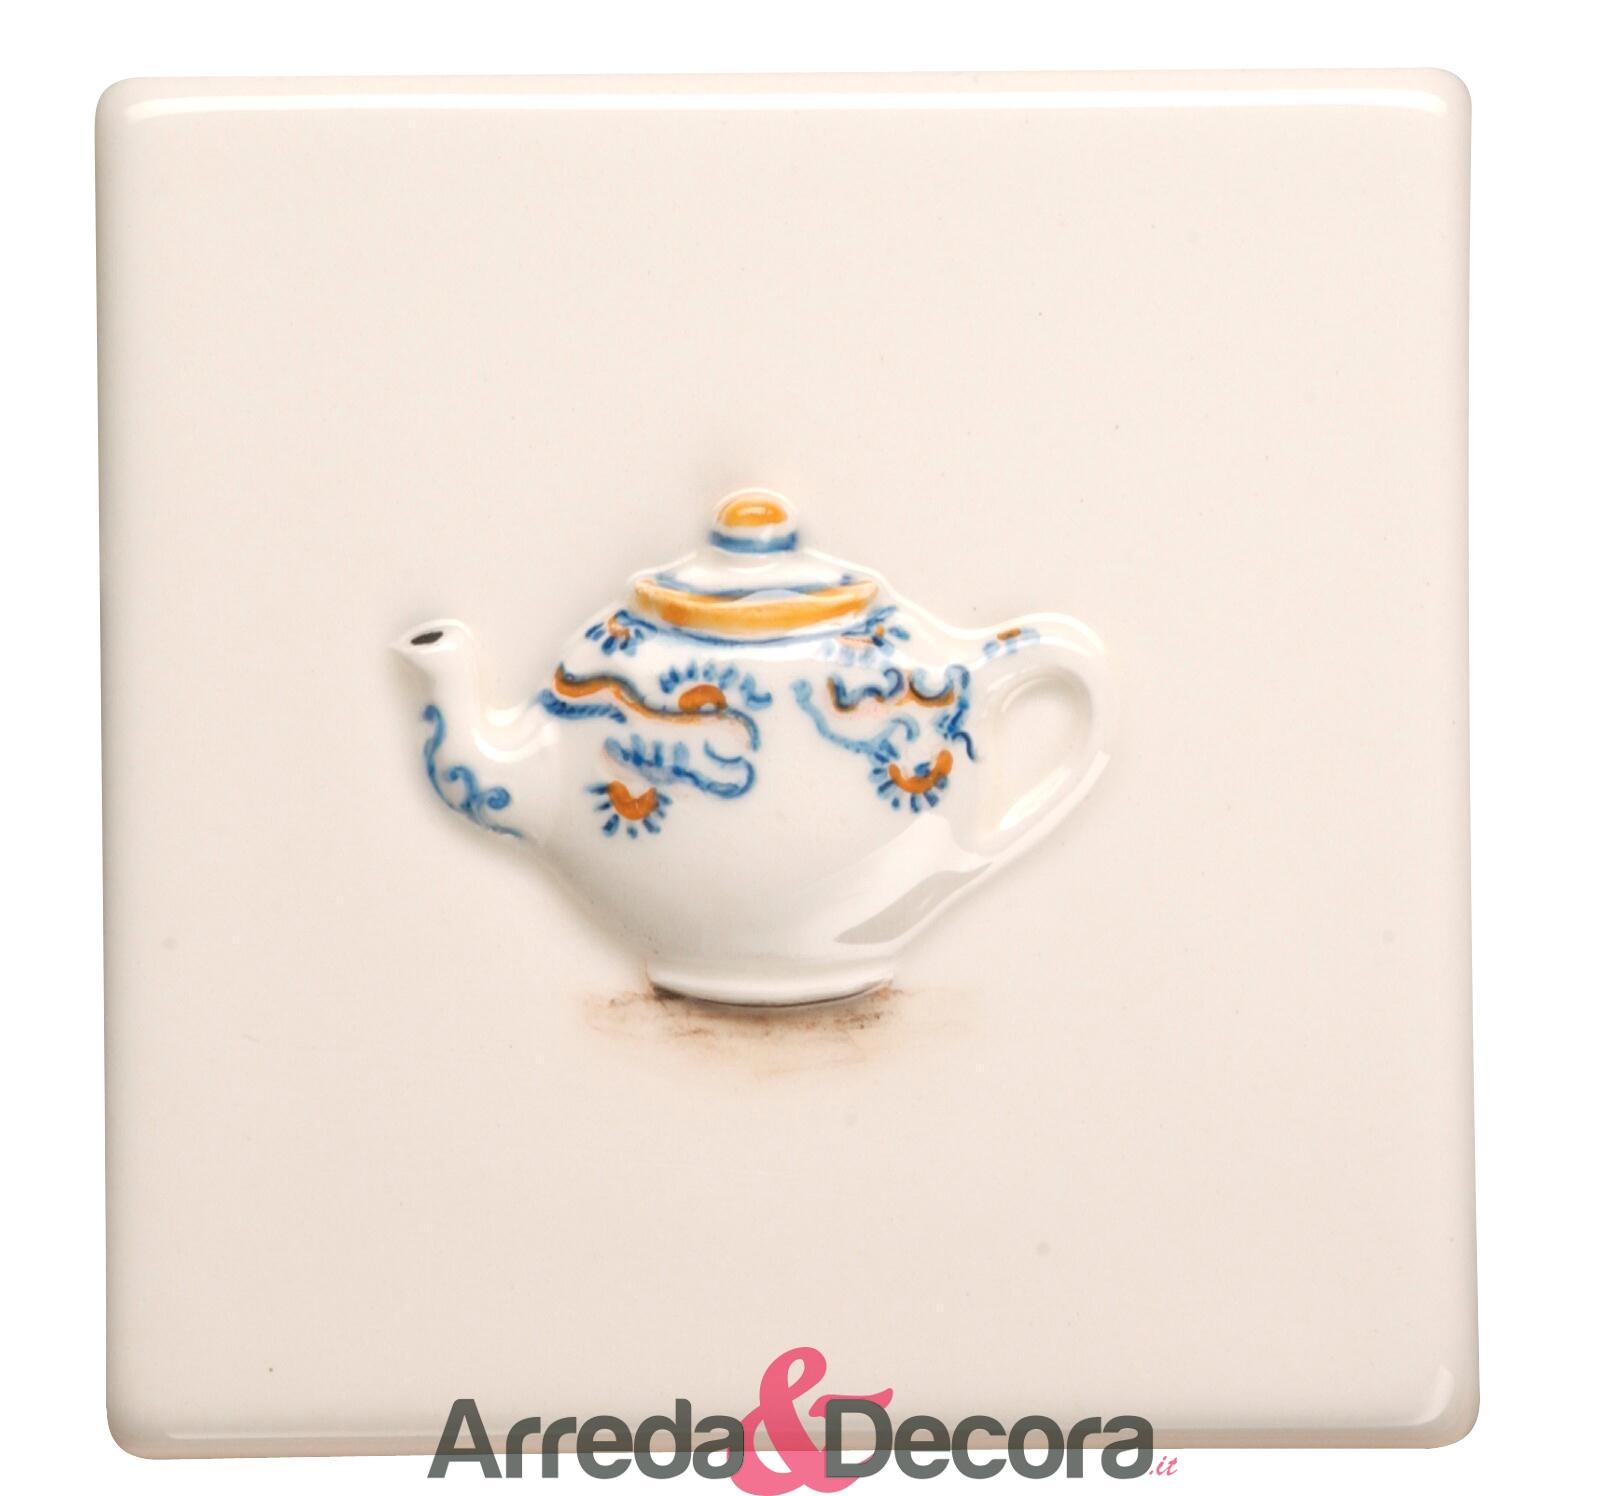 decoro-10x10-teiera-the